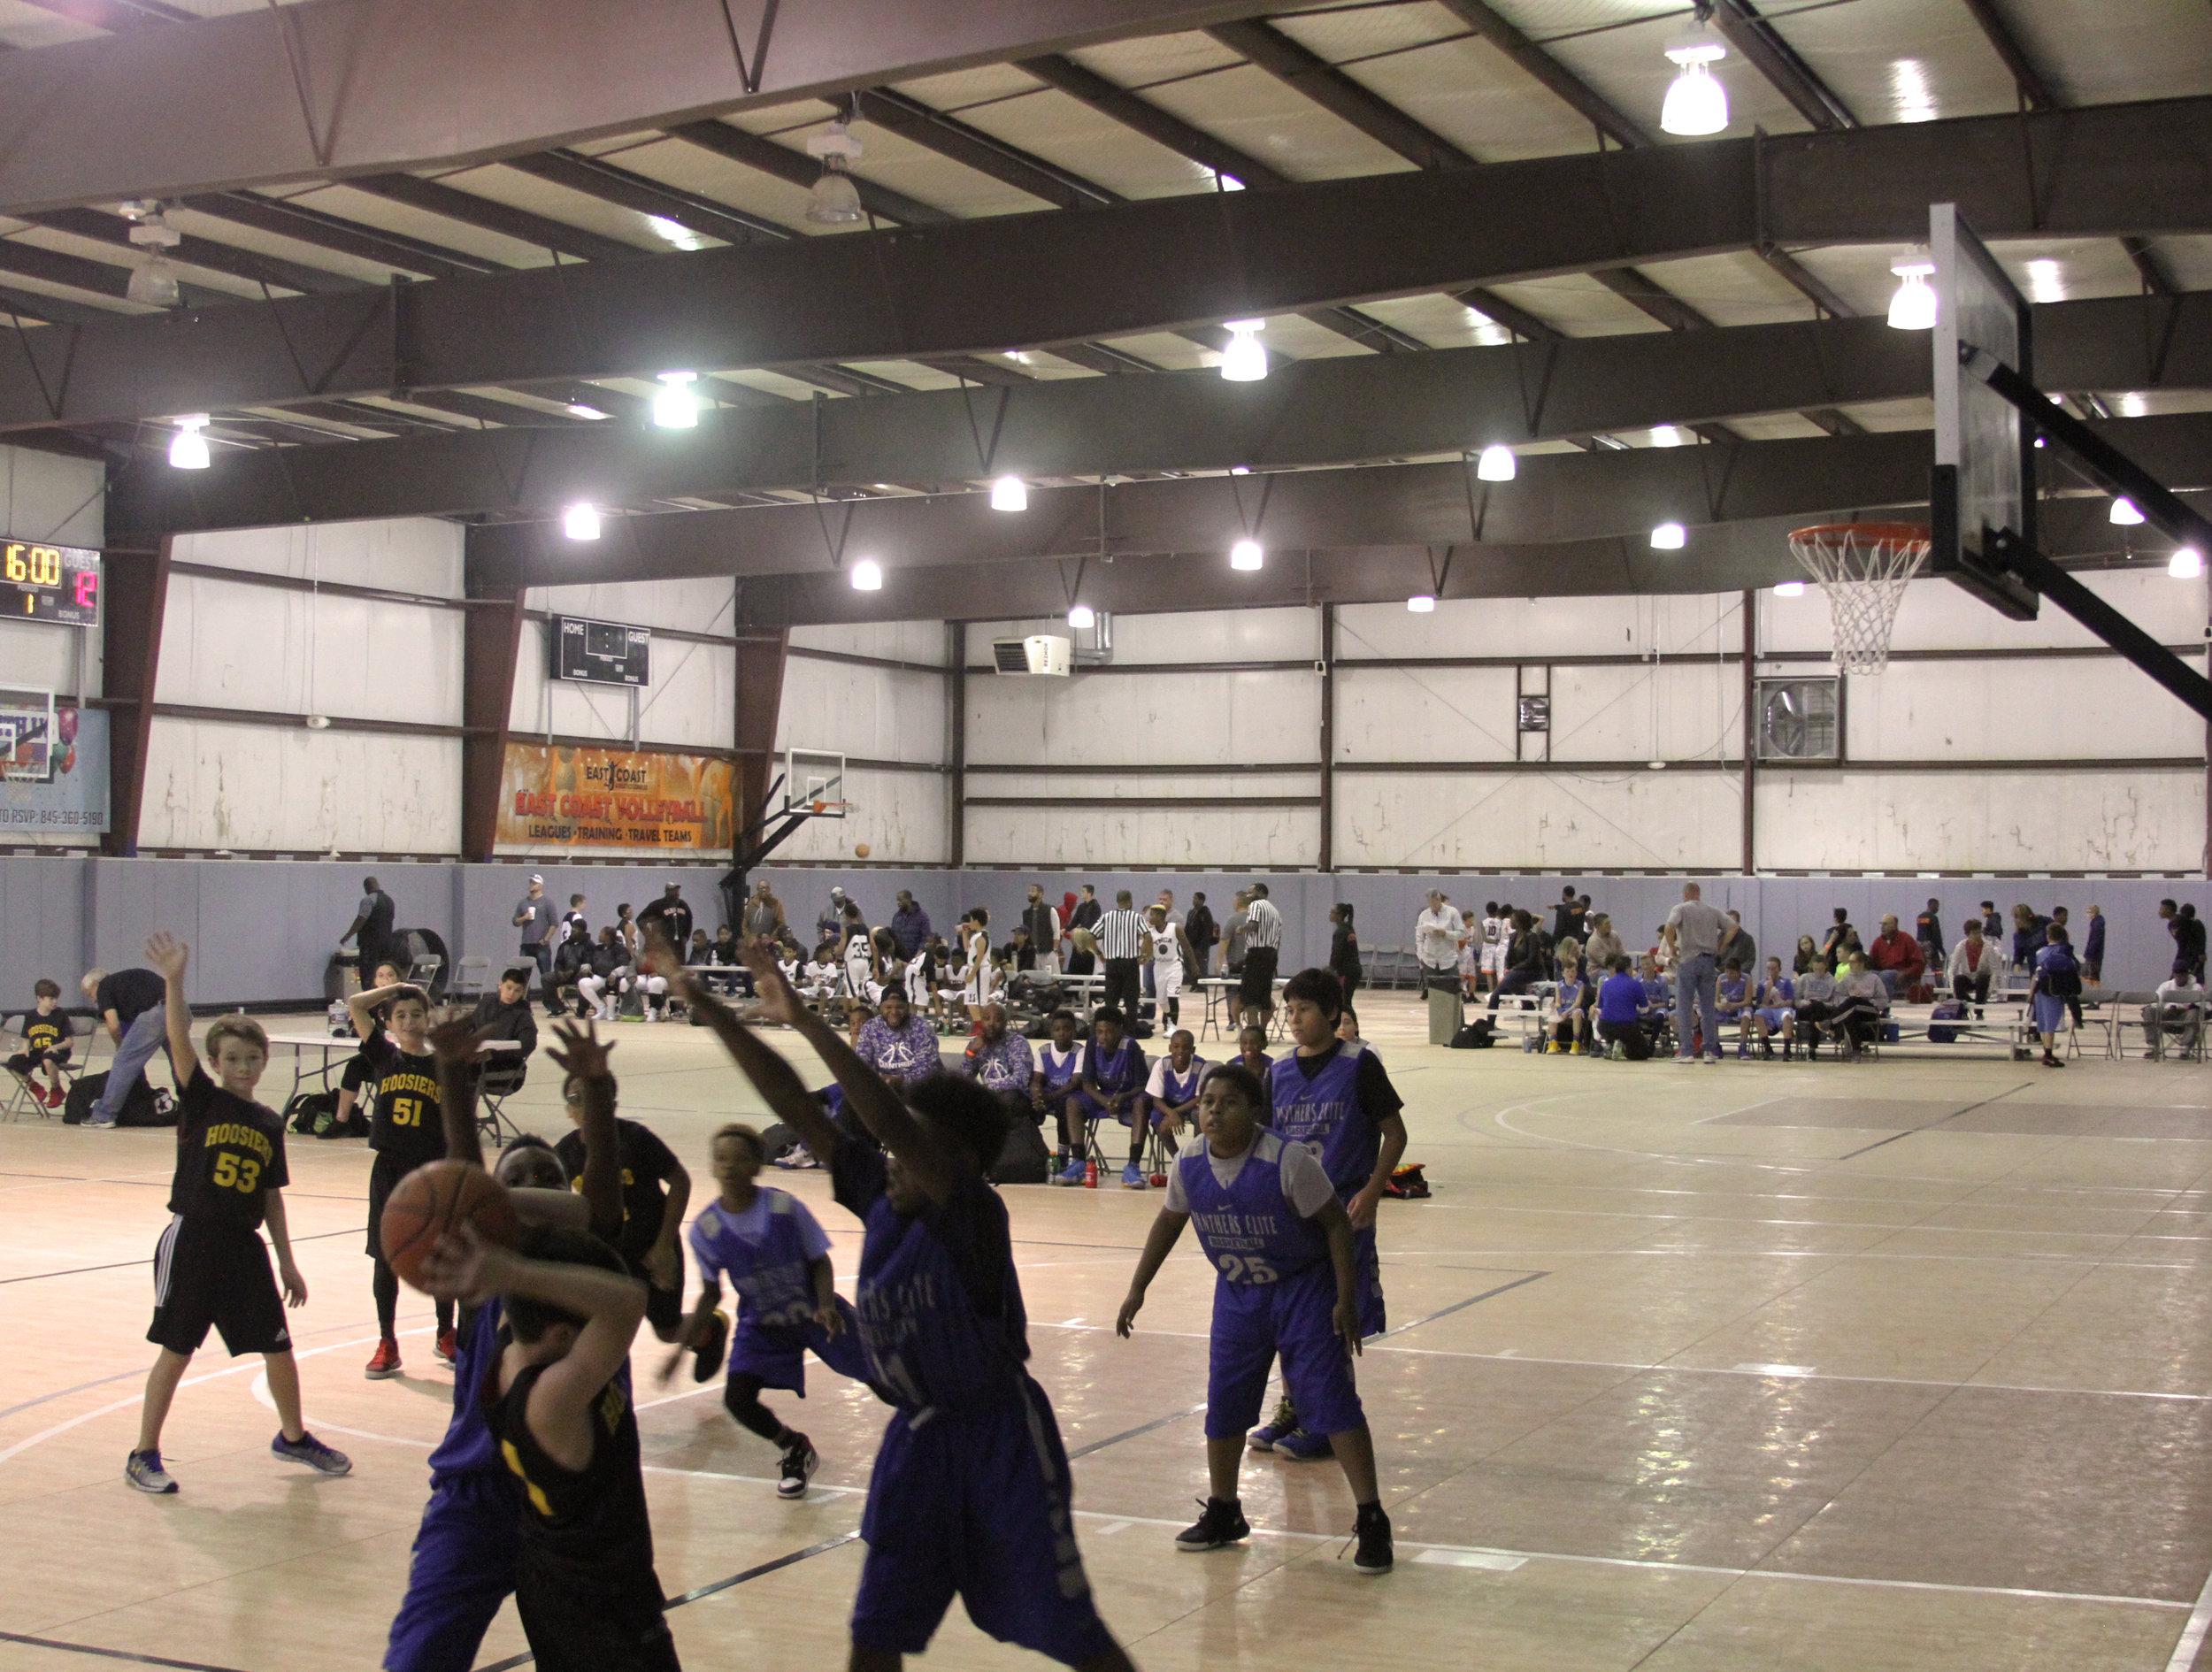 AAU Tournament Crowded Gym.jpg